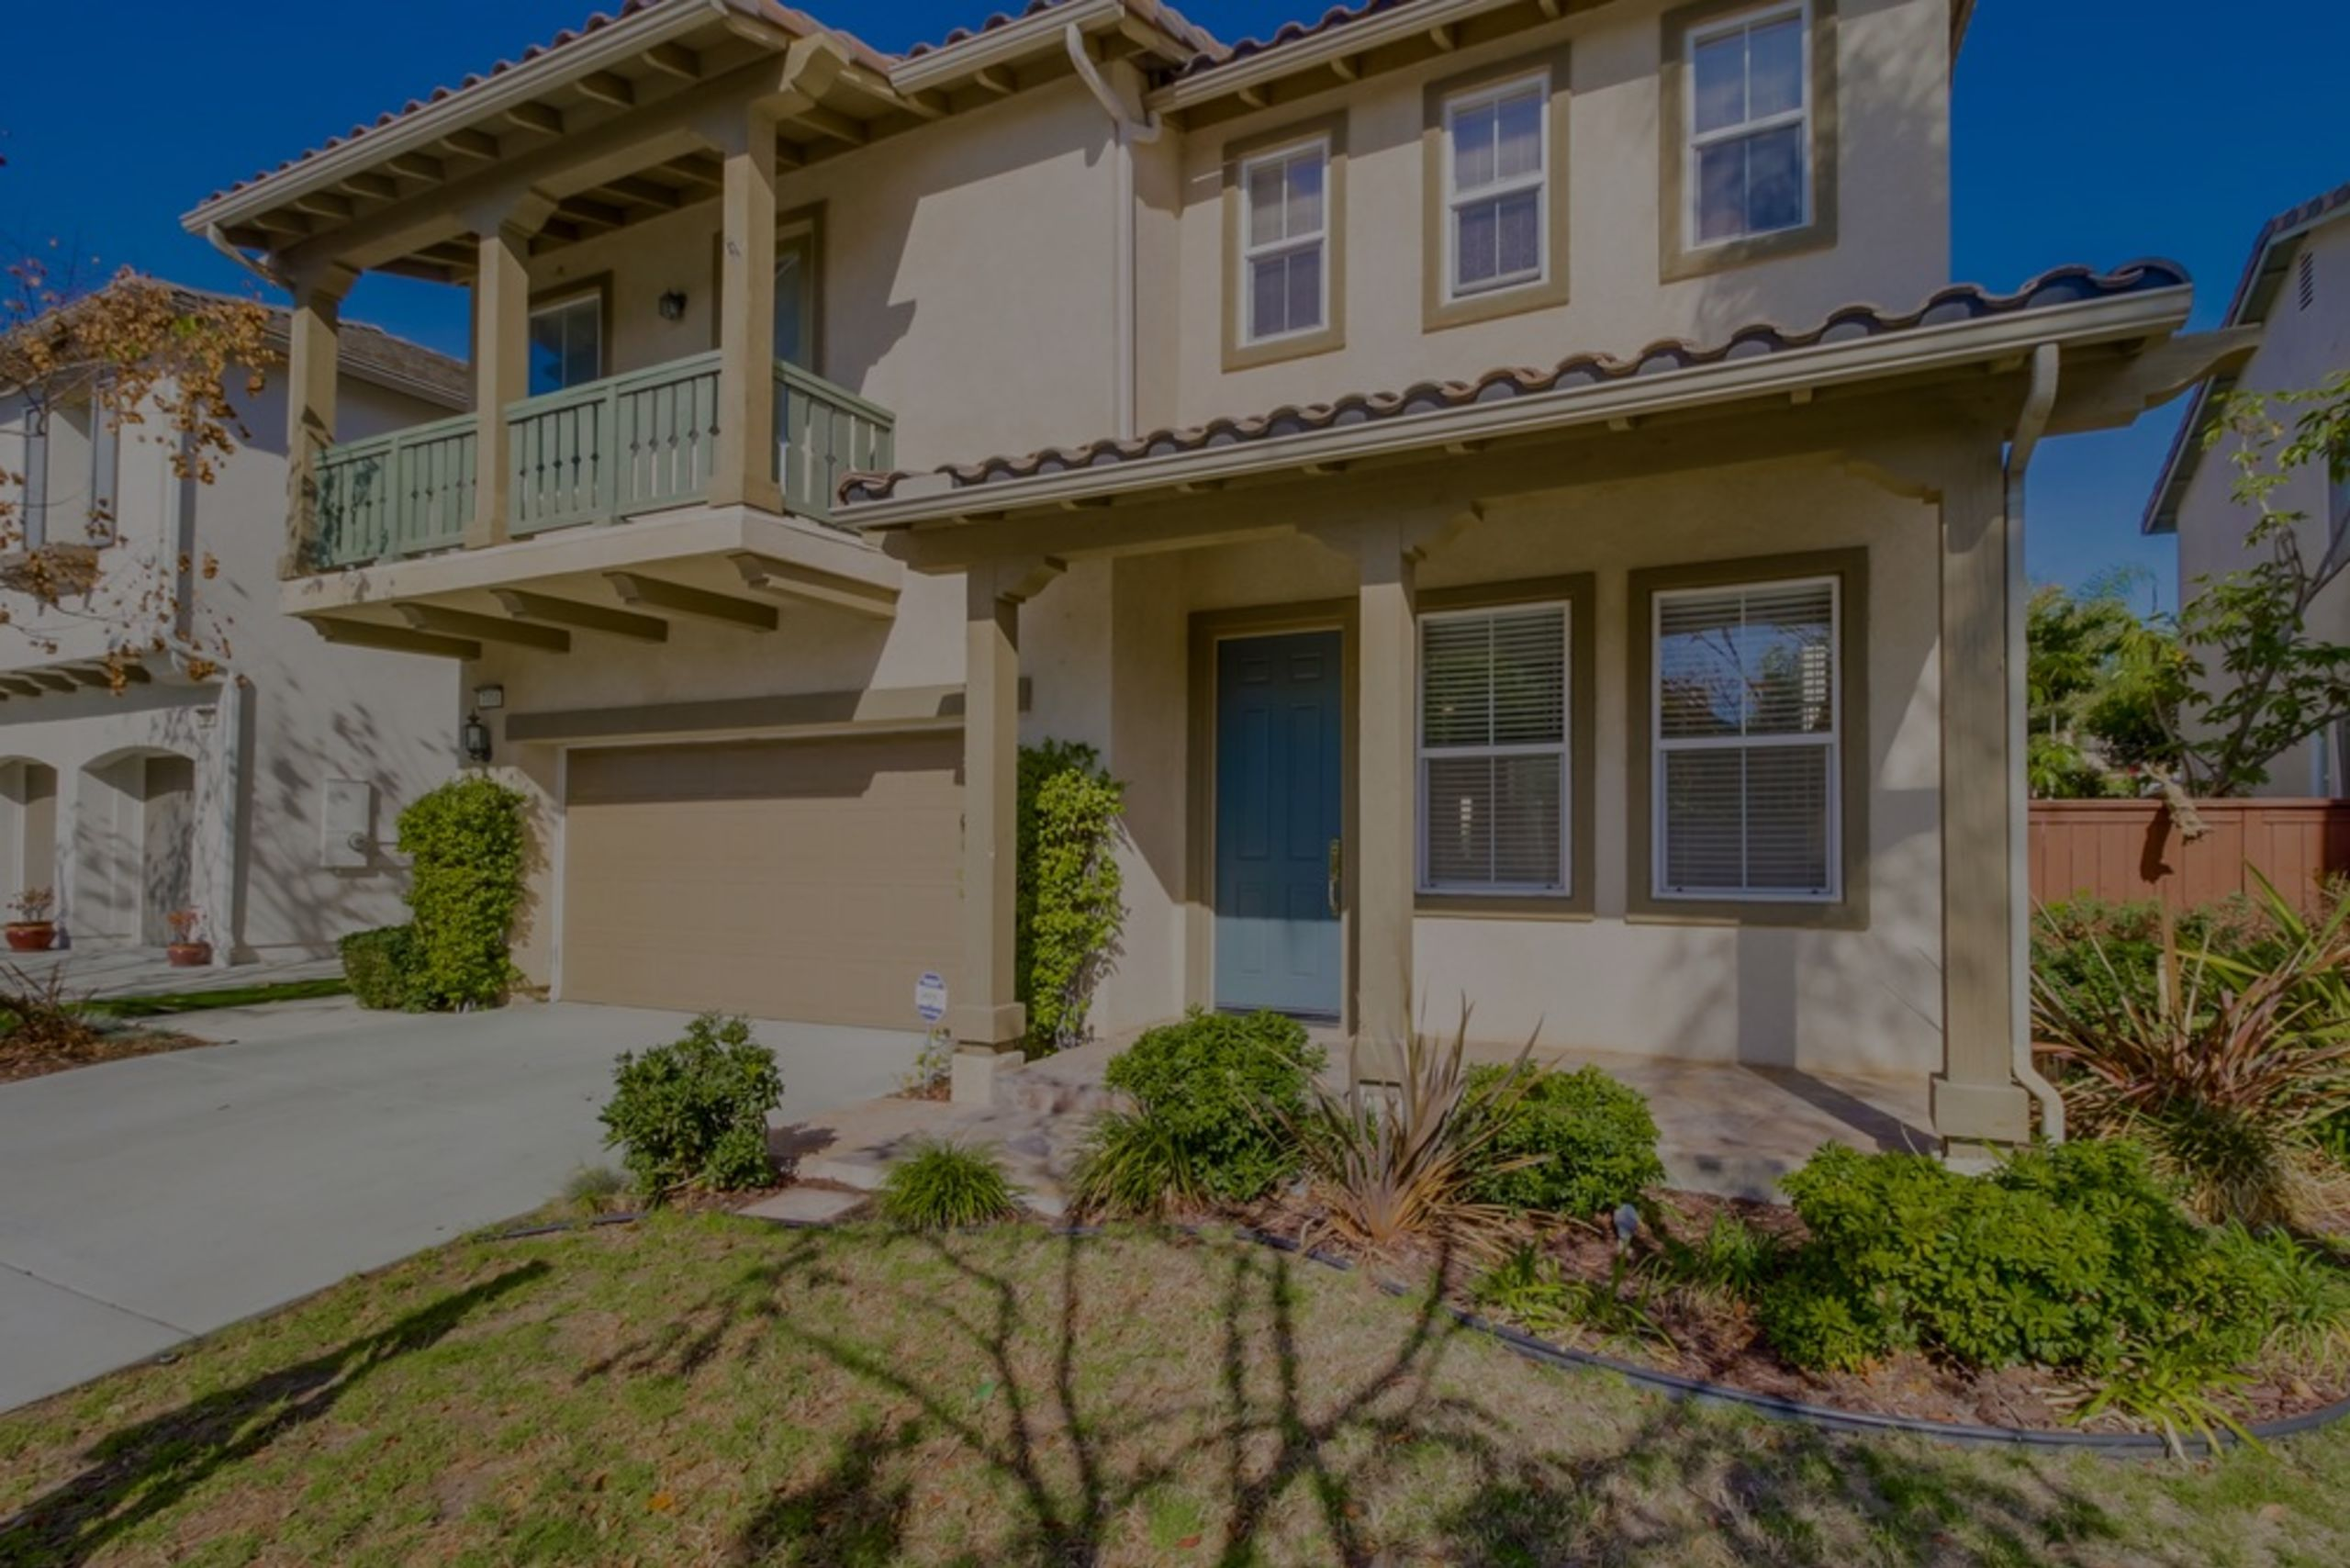 7414 Arroyo Grande Rd San Diego, CA 92129